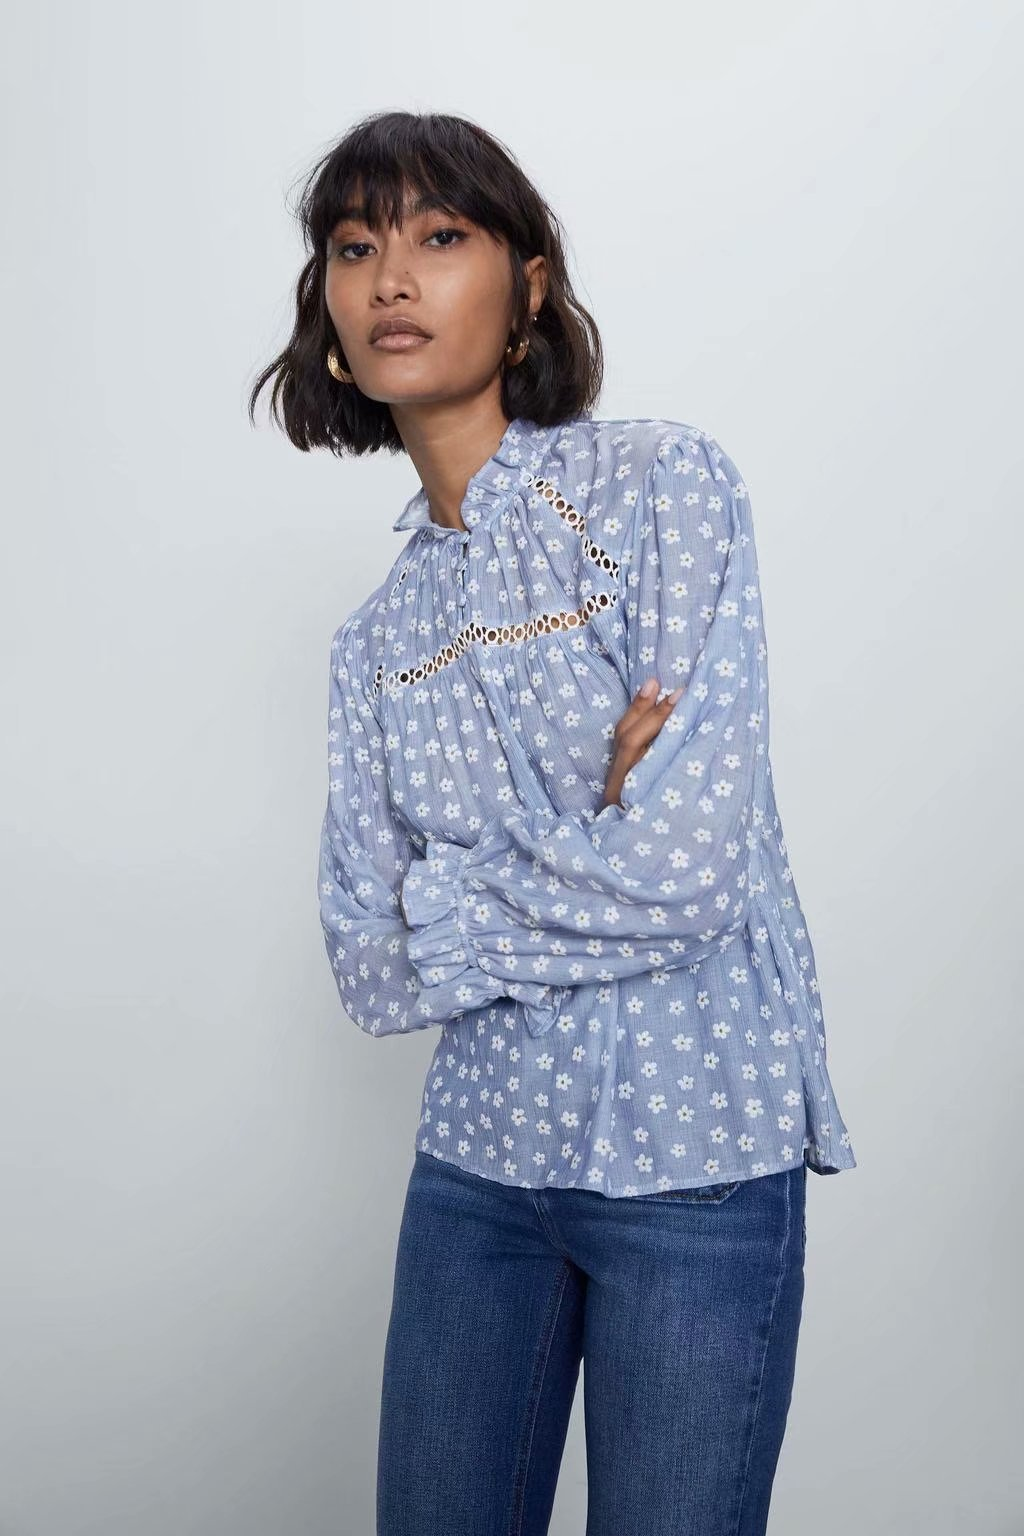 Blouse Women Plus Size Vintage Tops Clothes Cotton Zaraing Women Blouse Shirt Sheining Vadiming Female Blouse Shirt A9716